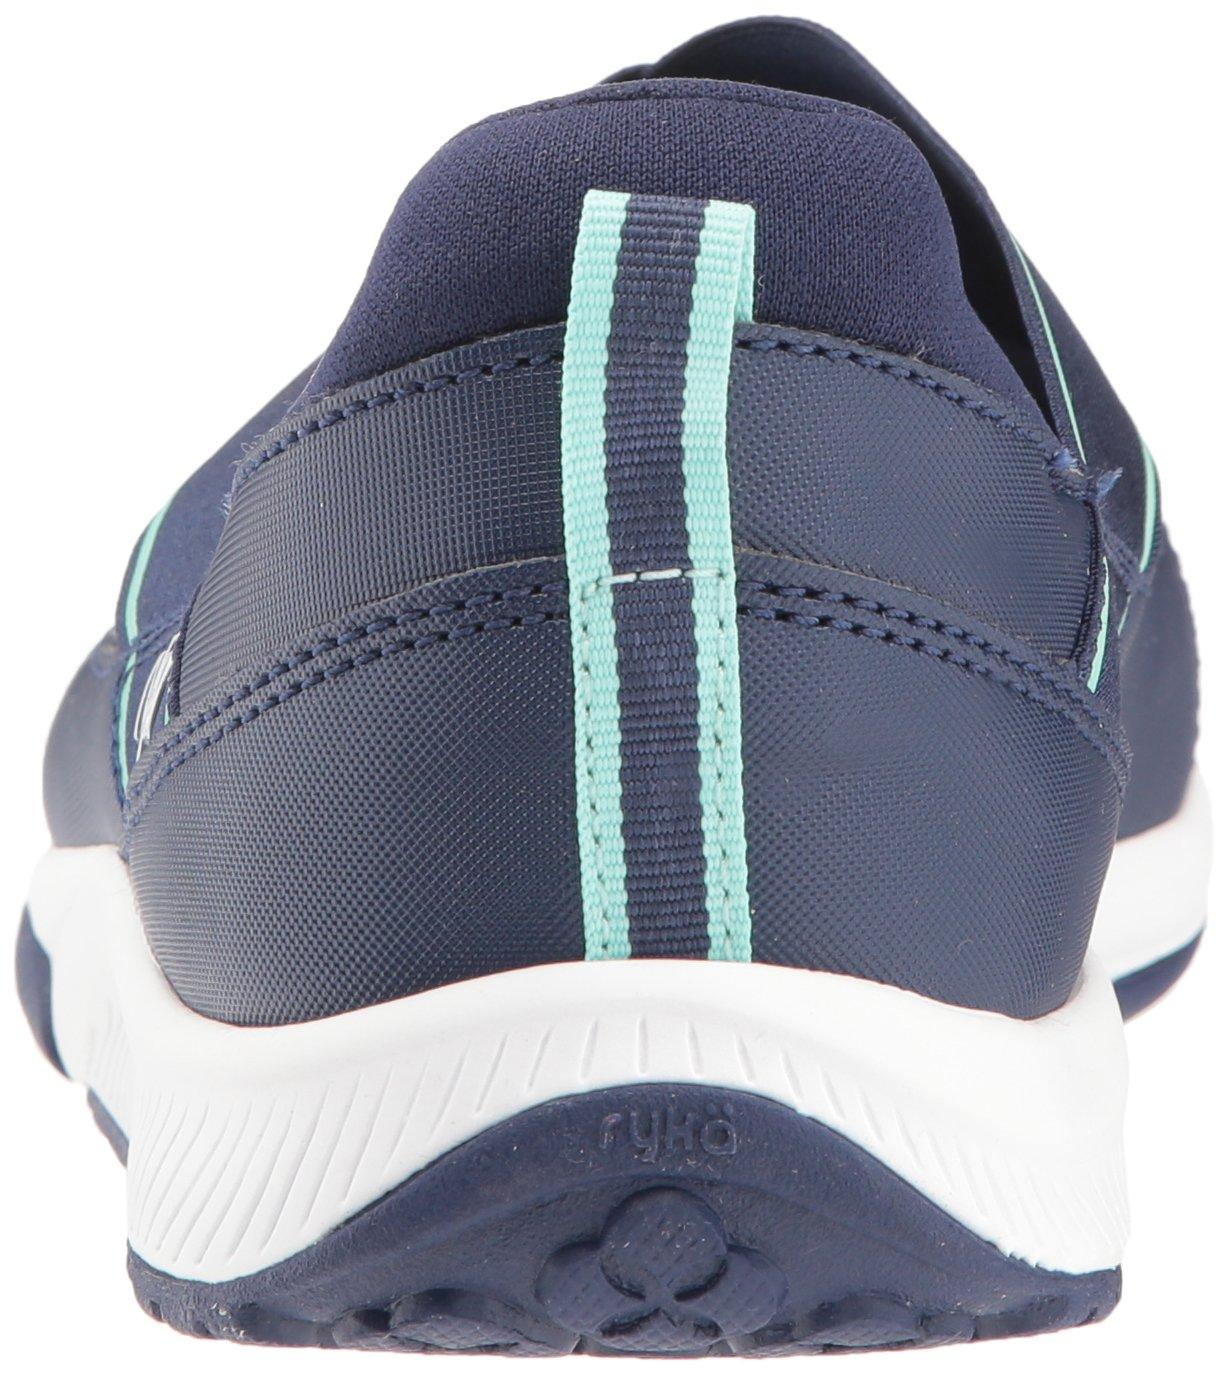 Ryka Women's klick Sneaker B0757DKPB6 7.5 B(M) US|Medieval Blue/White